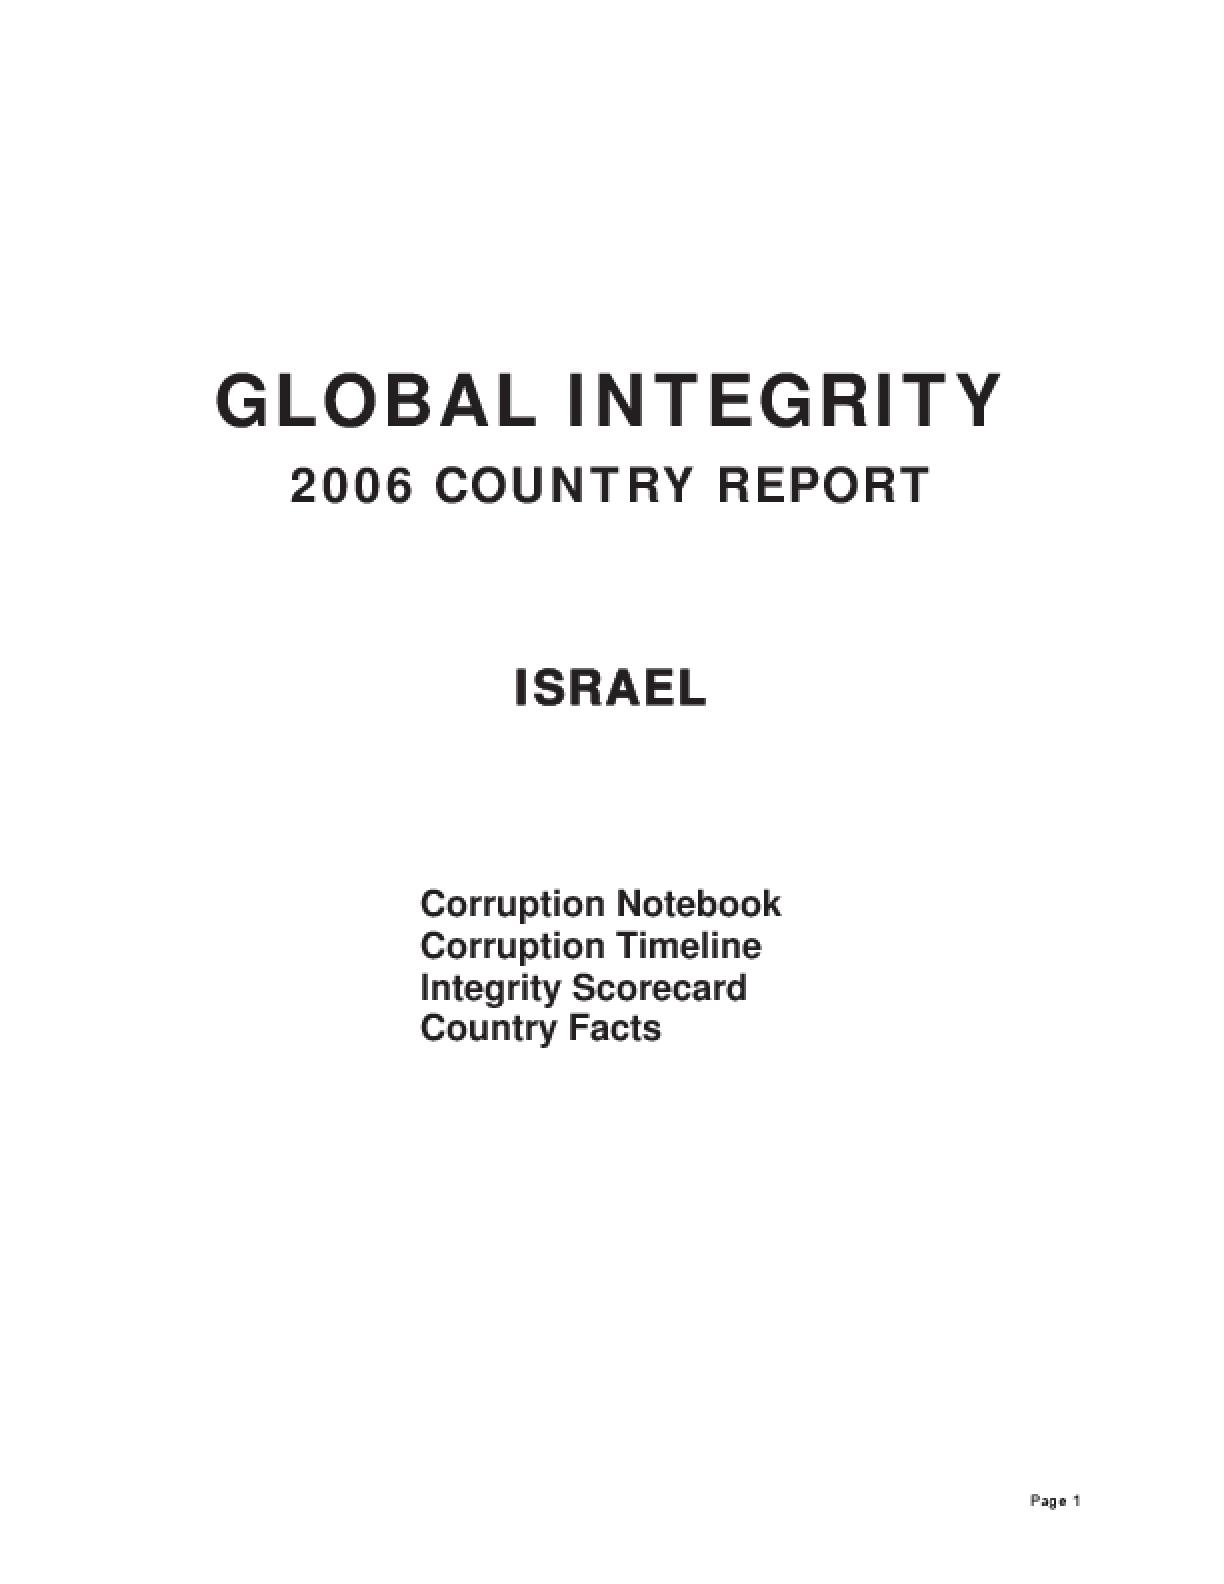 Global Integrity Report: Israel